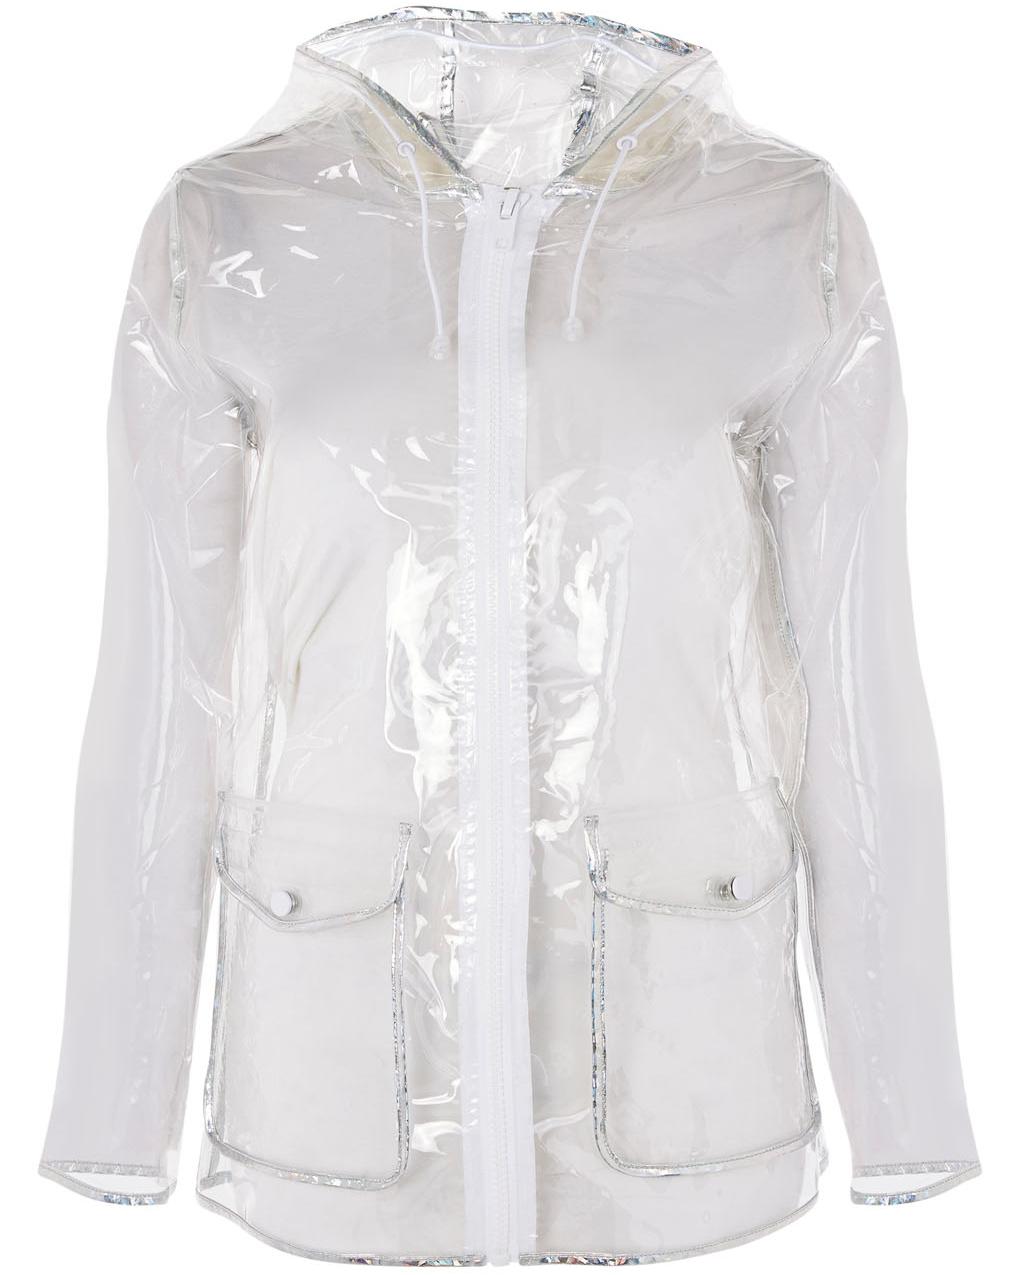 Topshop's Transparent Raincoat